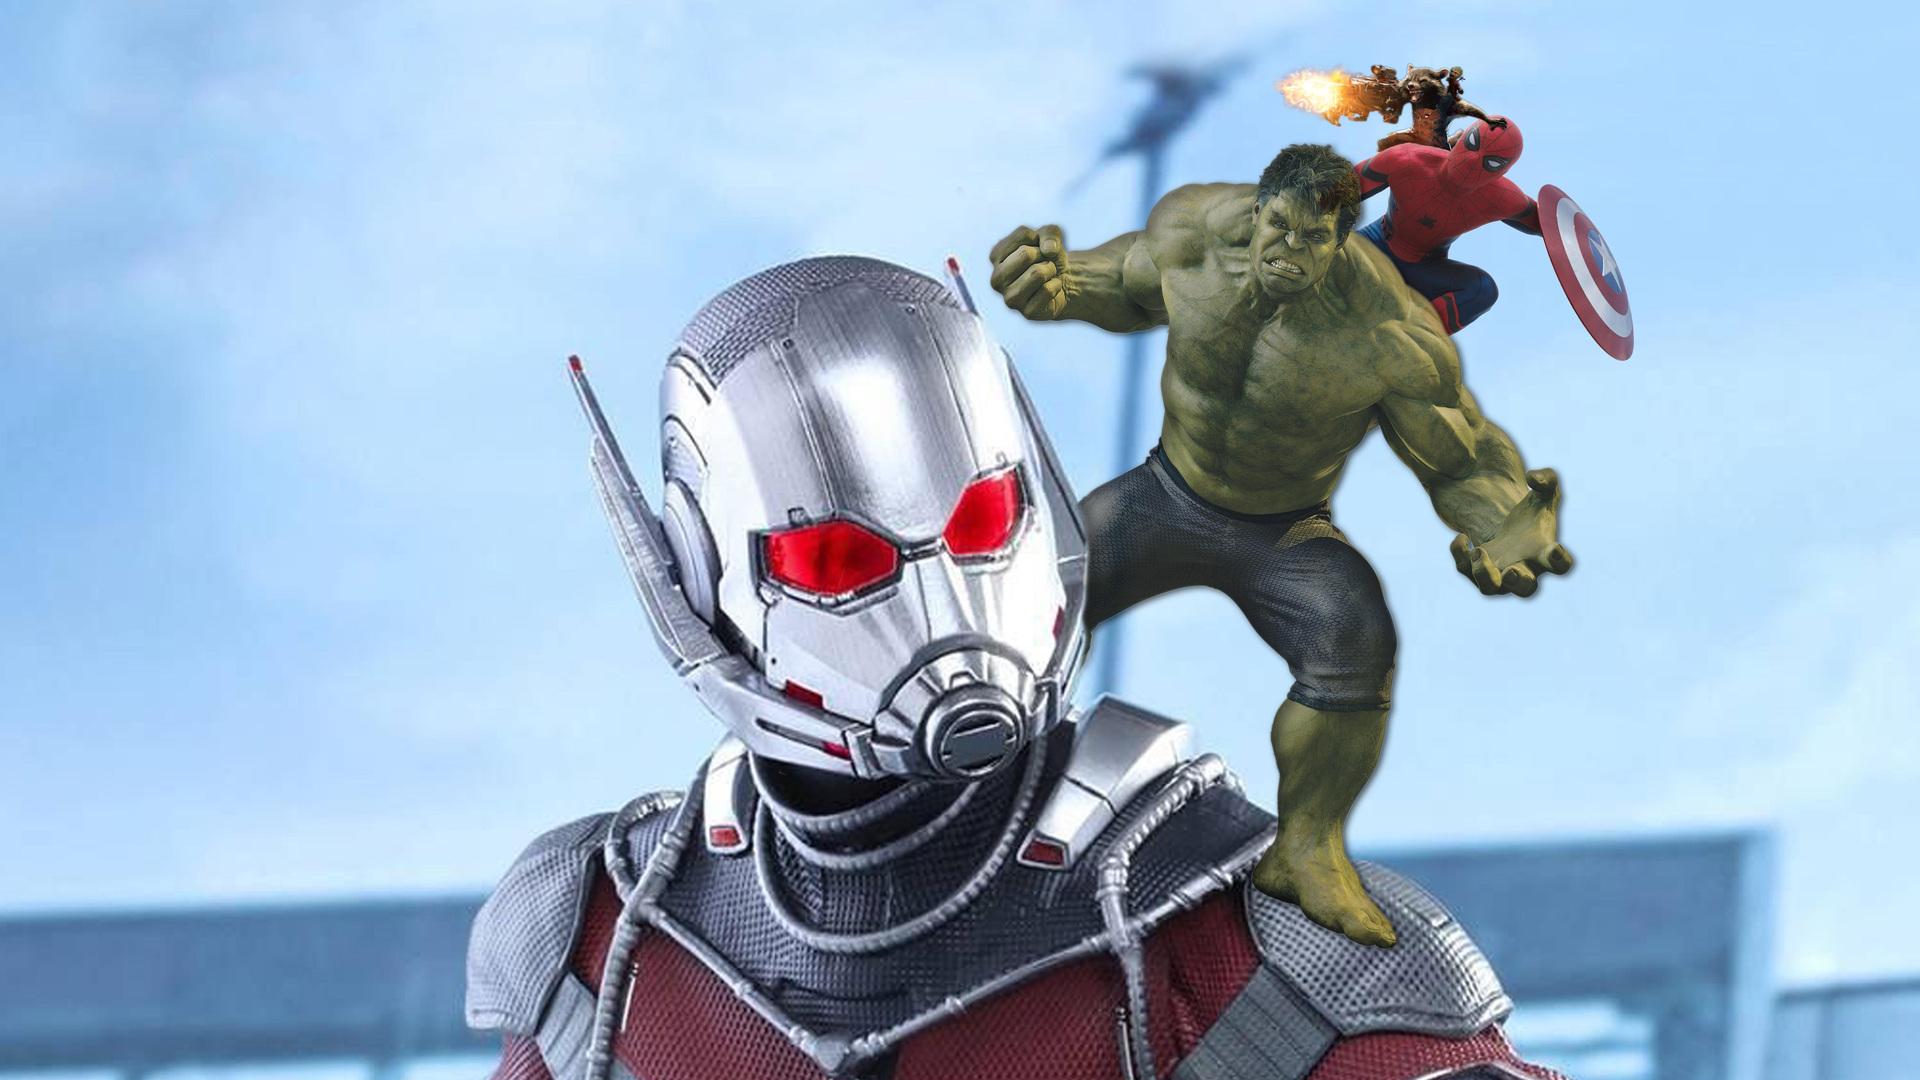 Ant Man Hulk Spiderman Rocket Baby Groot 5k